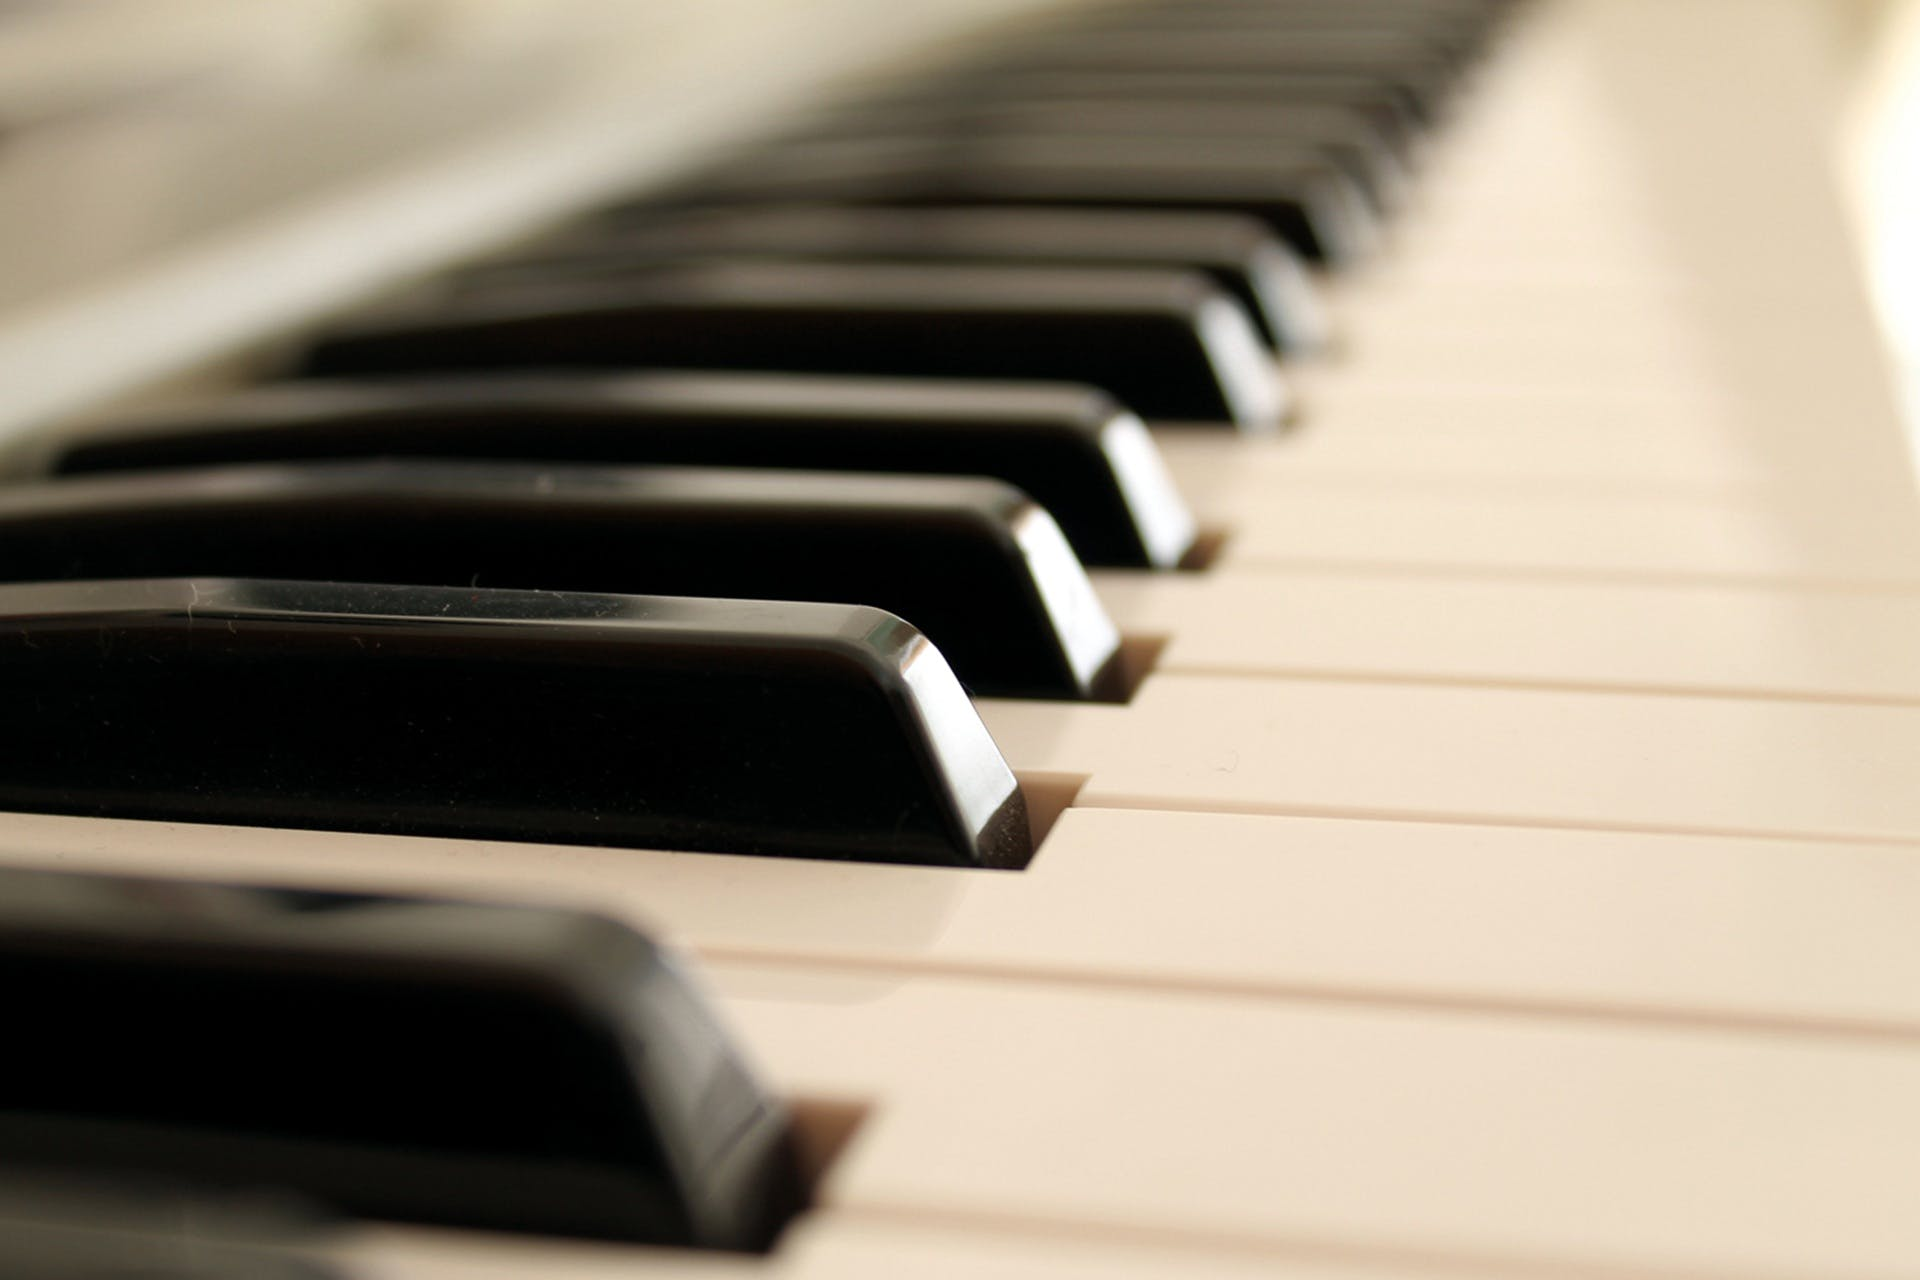 Free stock photo of auditorium, dance, instruments, keyboard